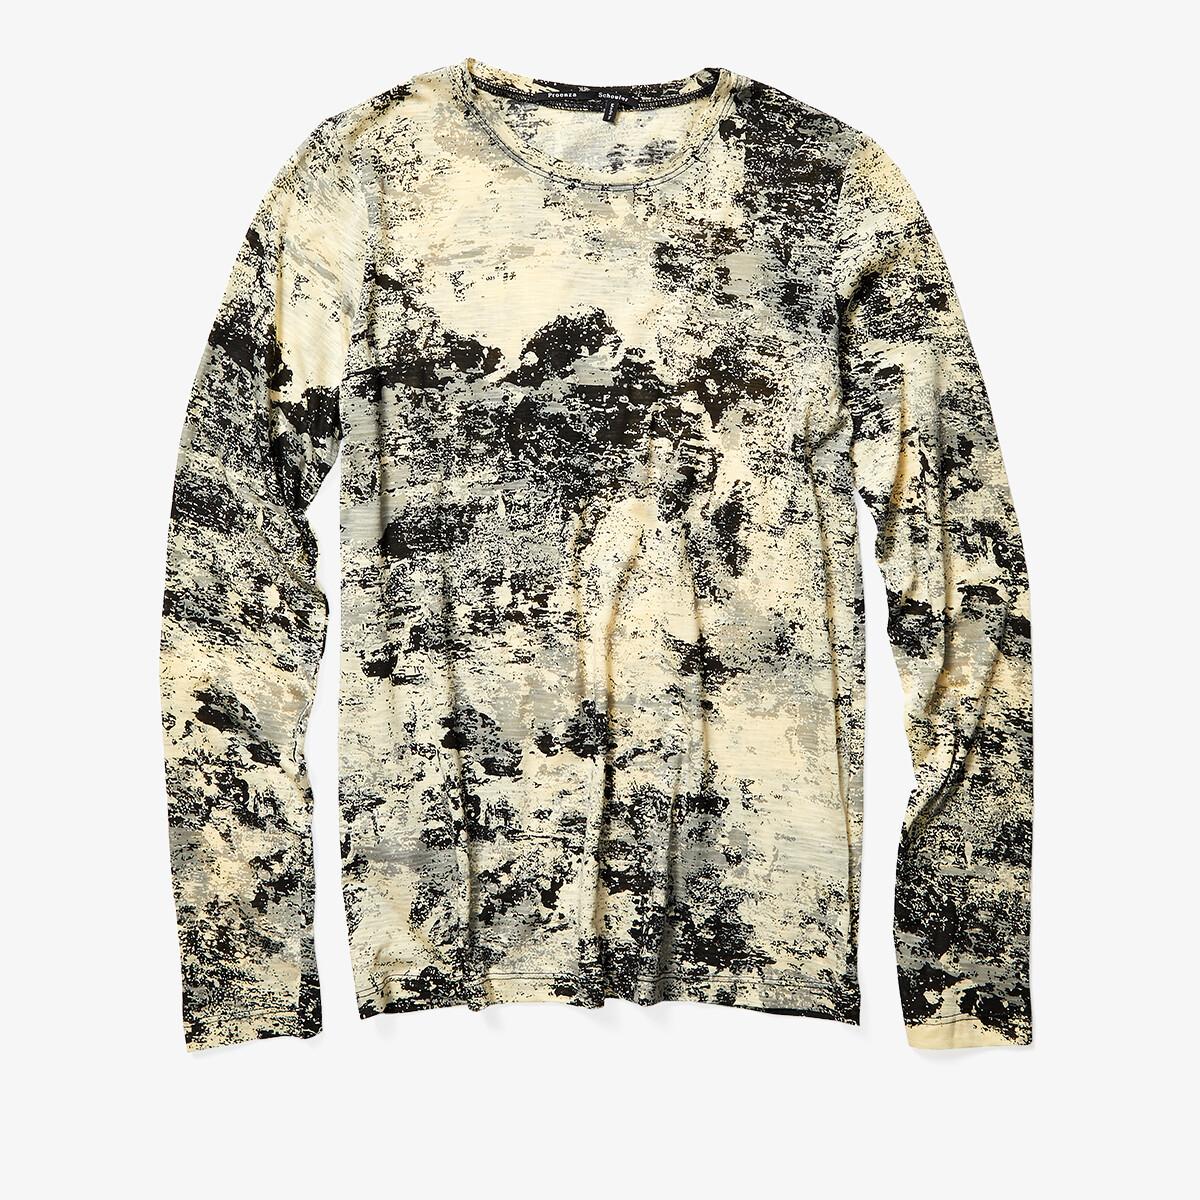 Imbracaminte Femei Proenza Schouler Long Sleeve Printed T-Shirt Pale YellowBlack Foil